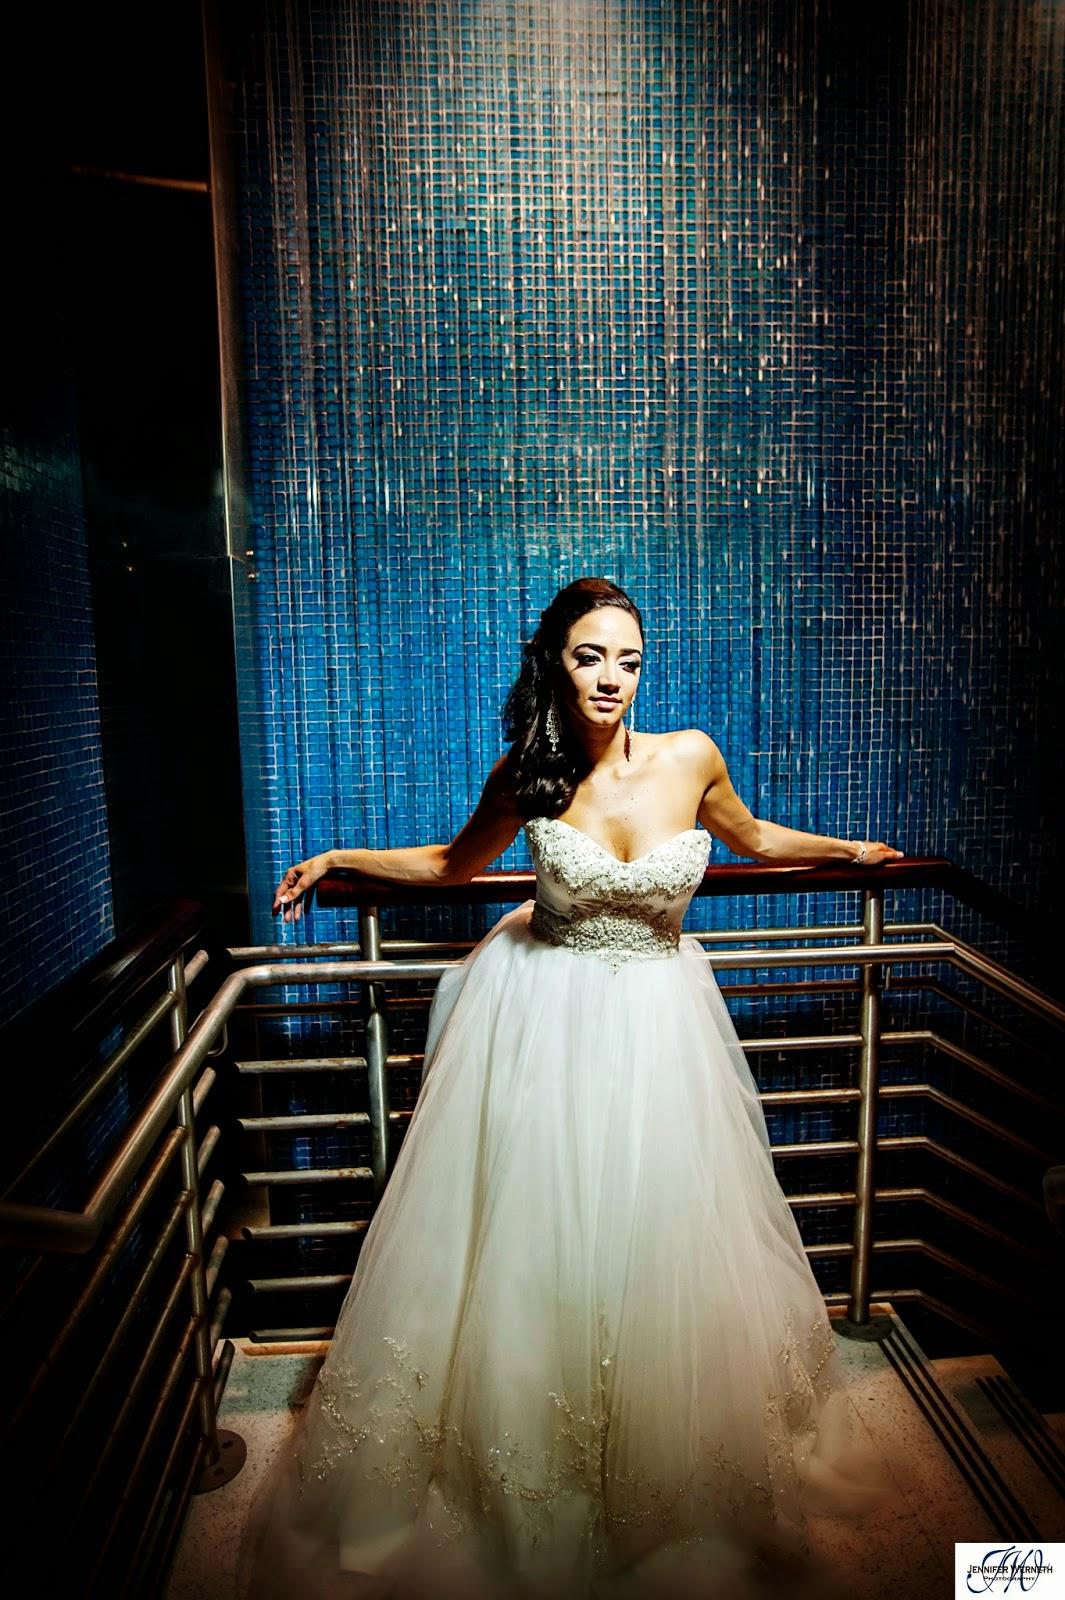 Fantastic Bridesmaid Dresses Orlando Fl Image - All Wedding Dresses ...